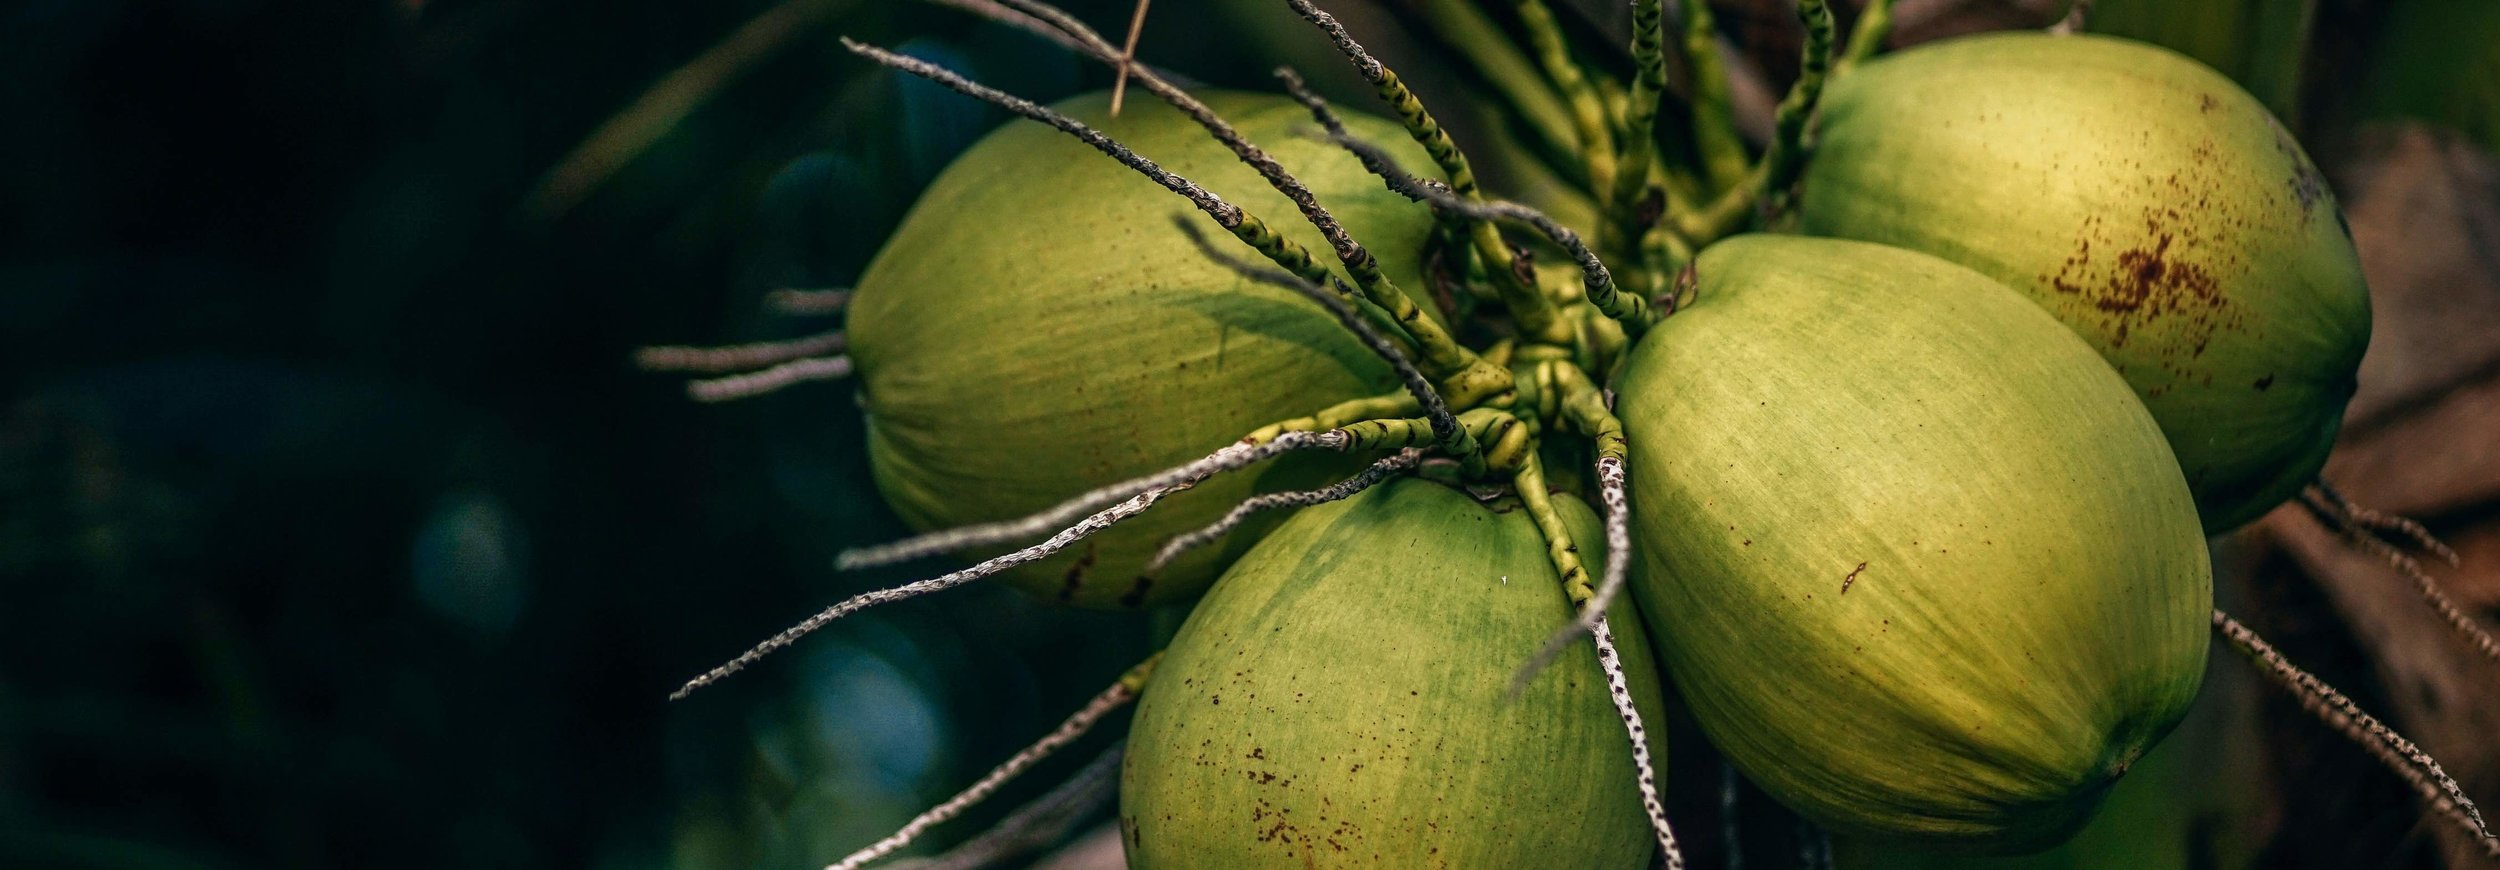 Coconut-oil-health.jpg